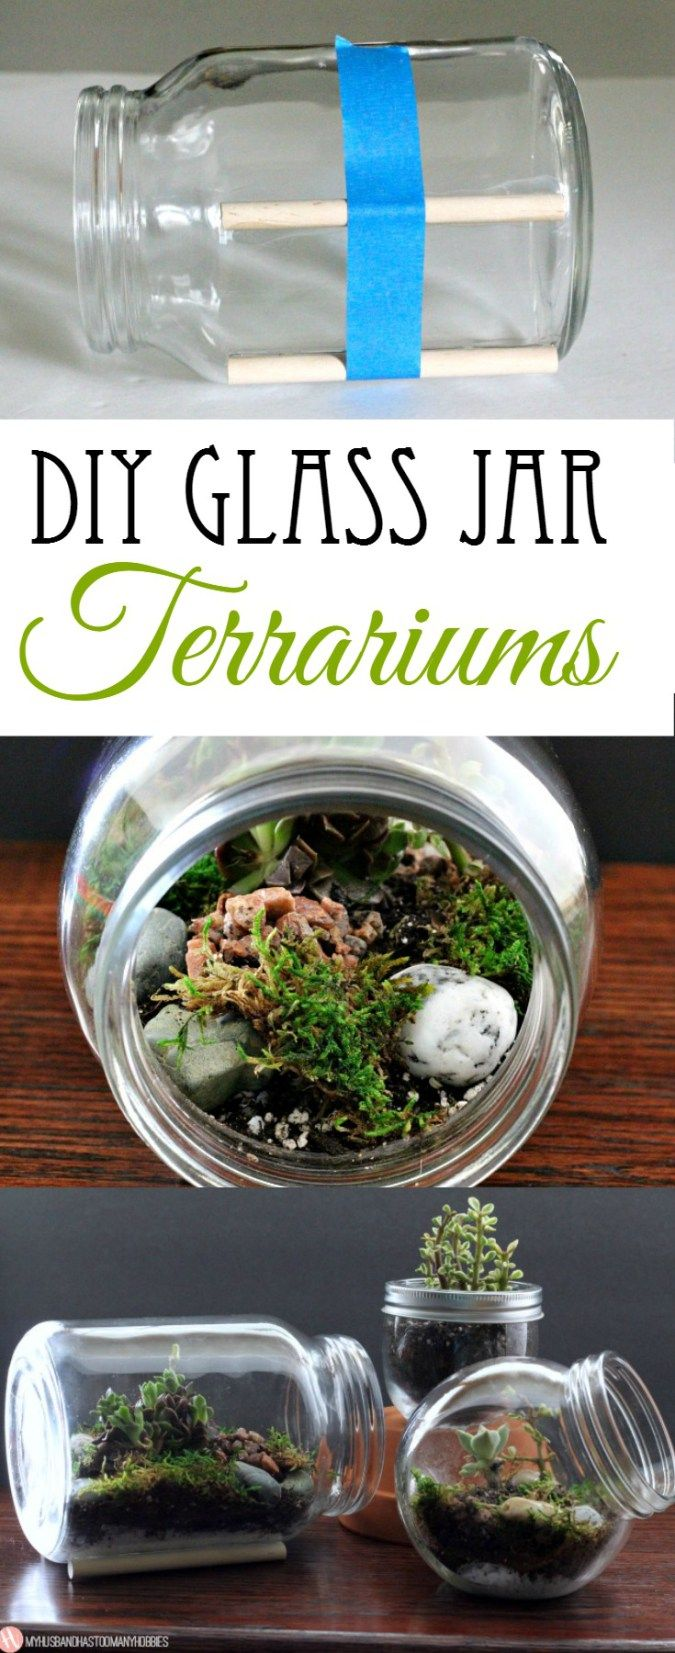 DIY Glass Jar Terrariums Such a good idea with succulents! #Succulents #Terrariums #Minature